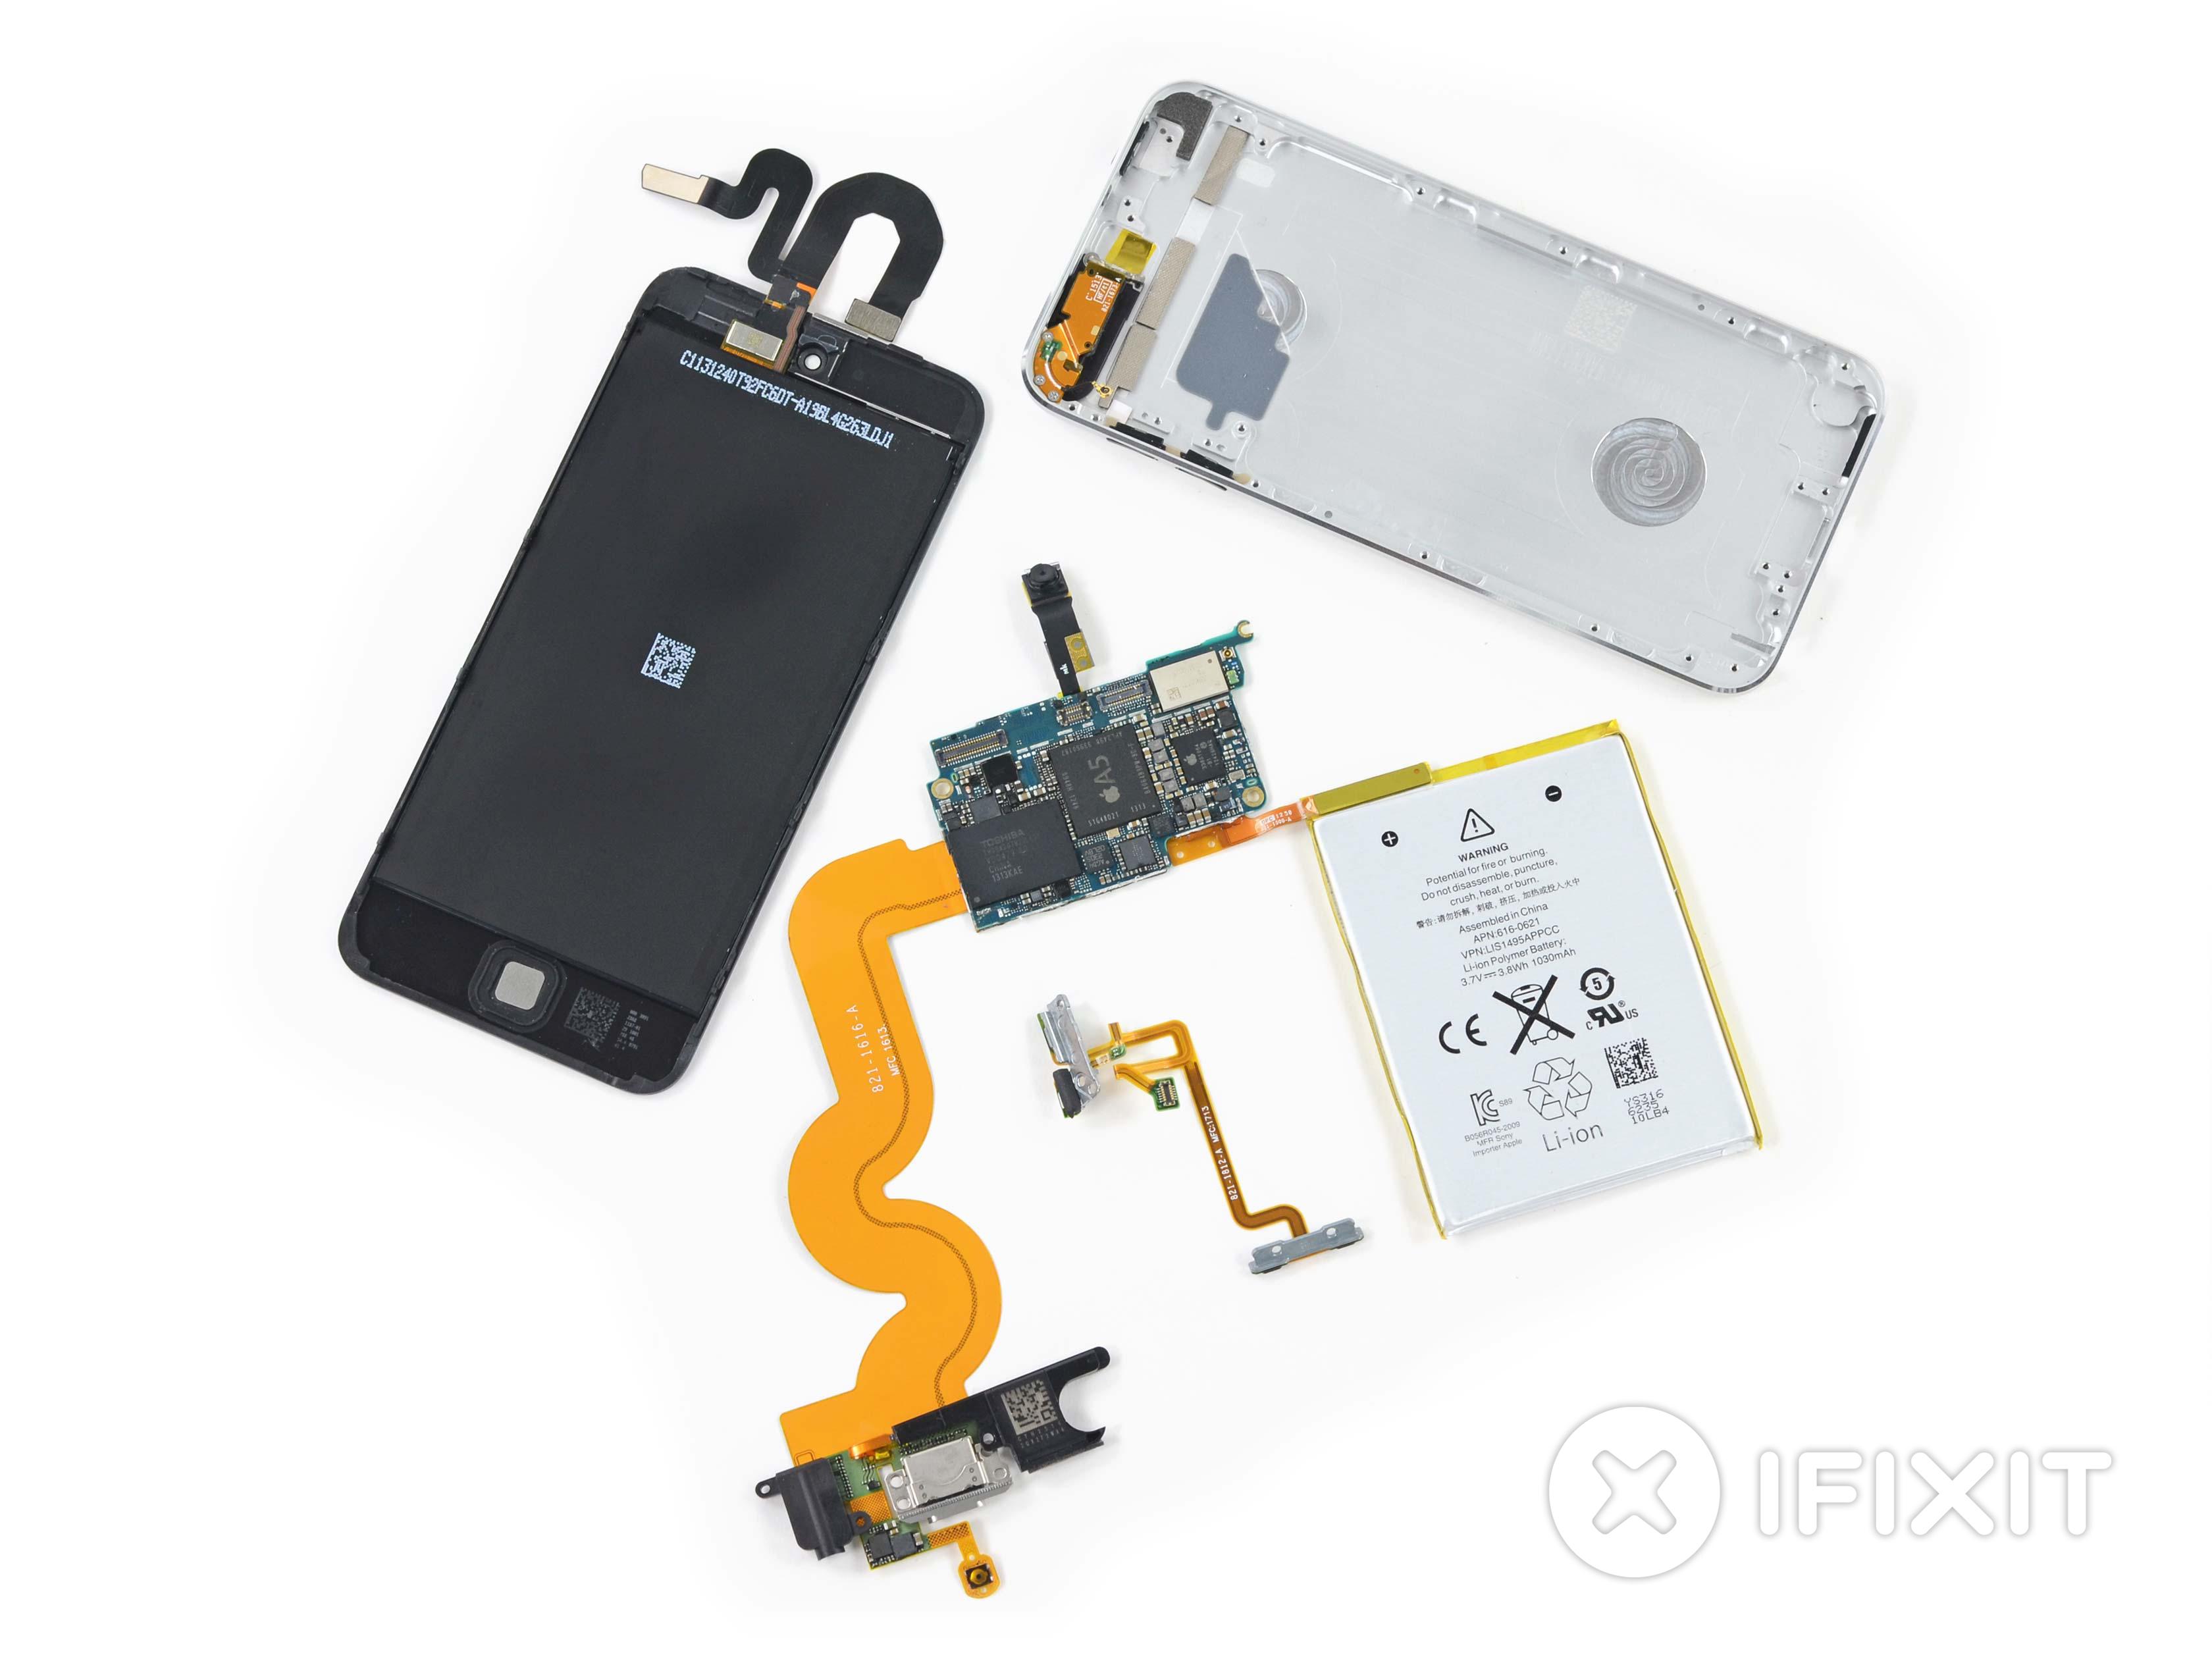 iPod Touch 5th Generation 16 GB Teardown